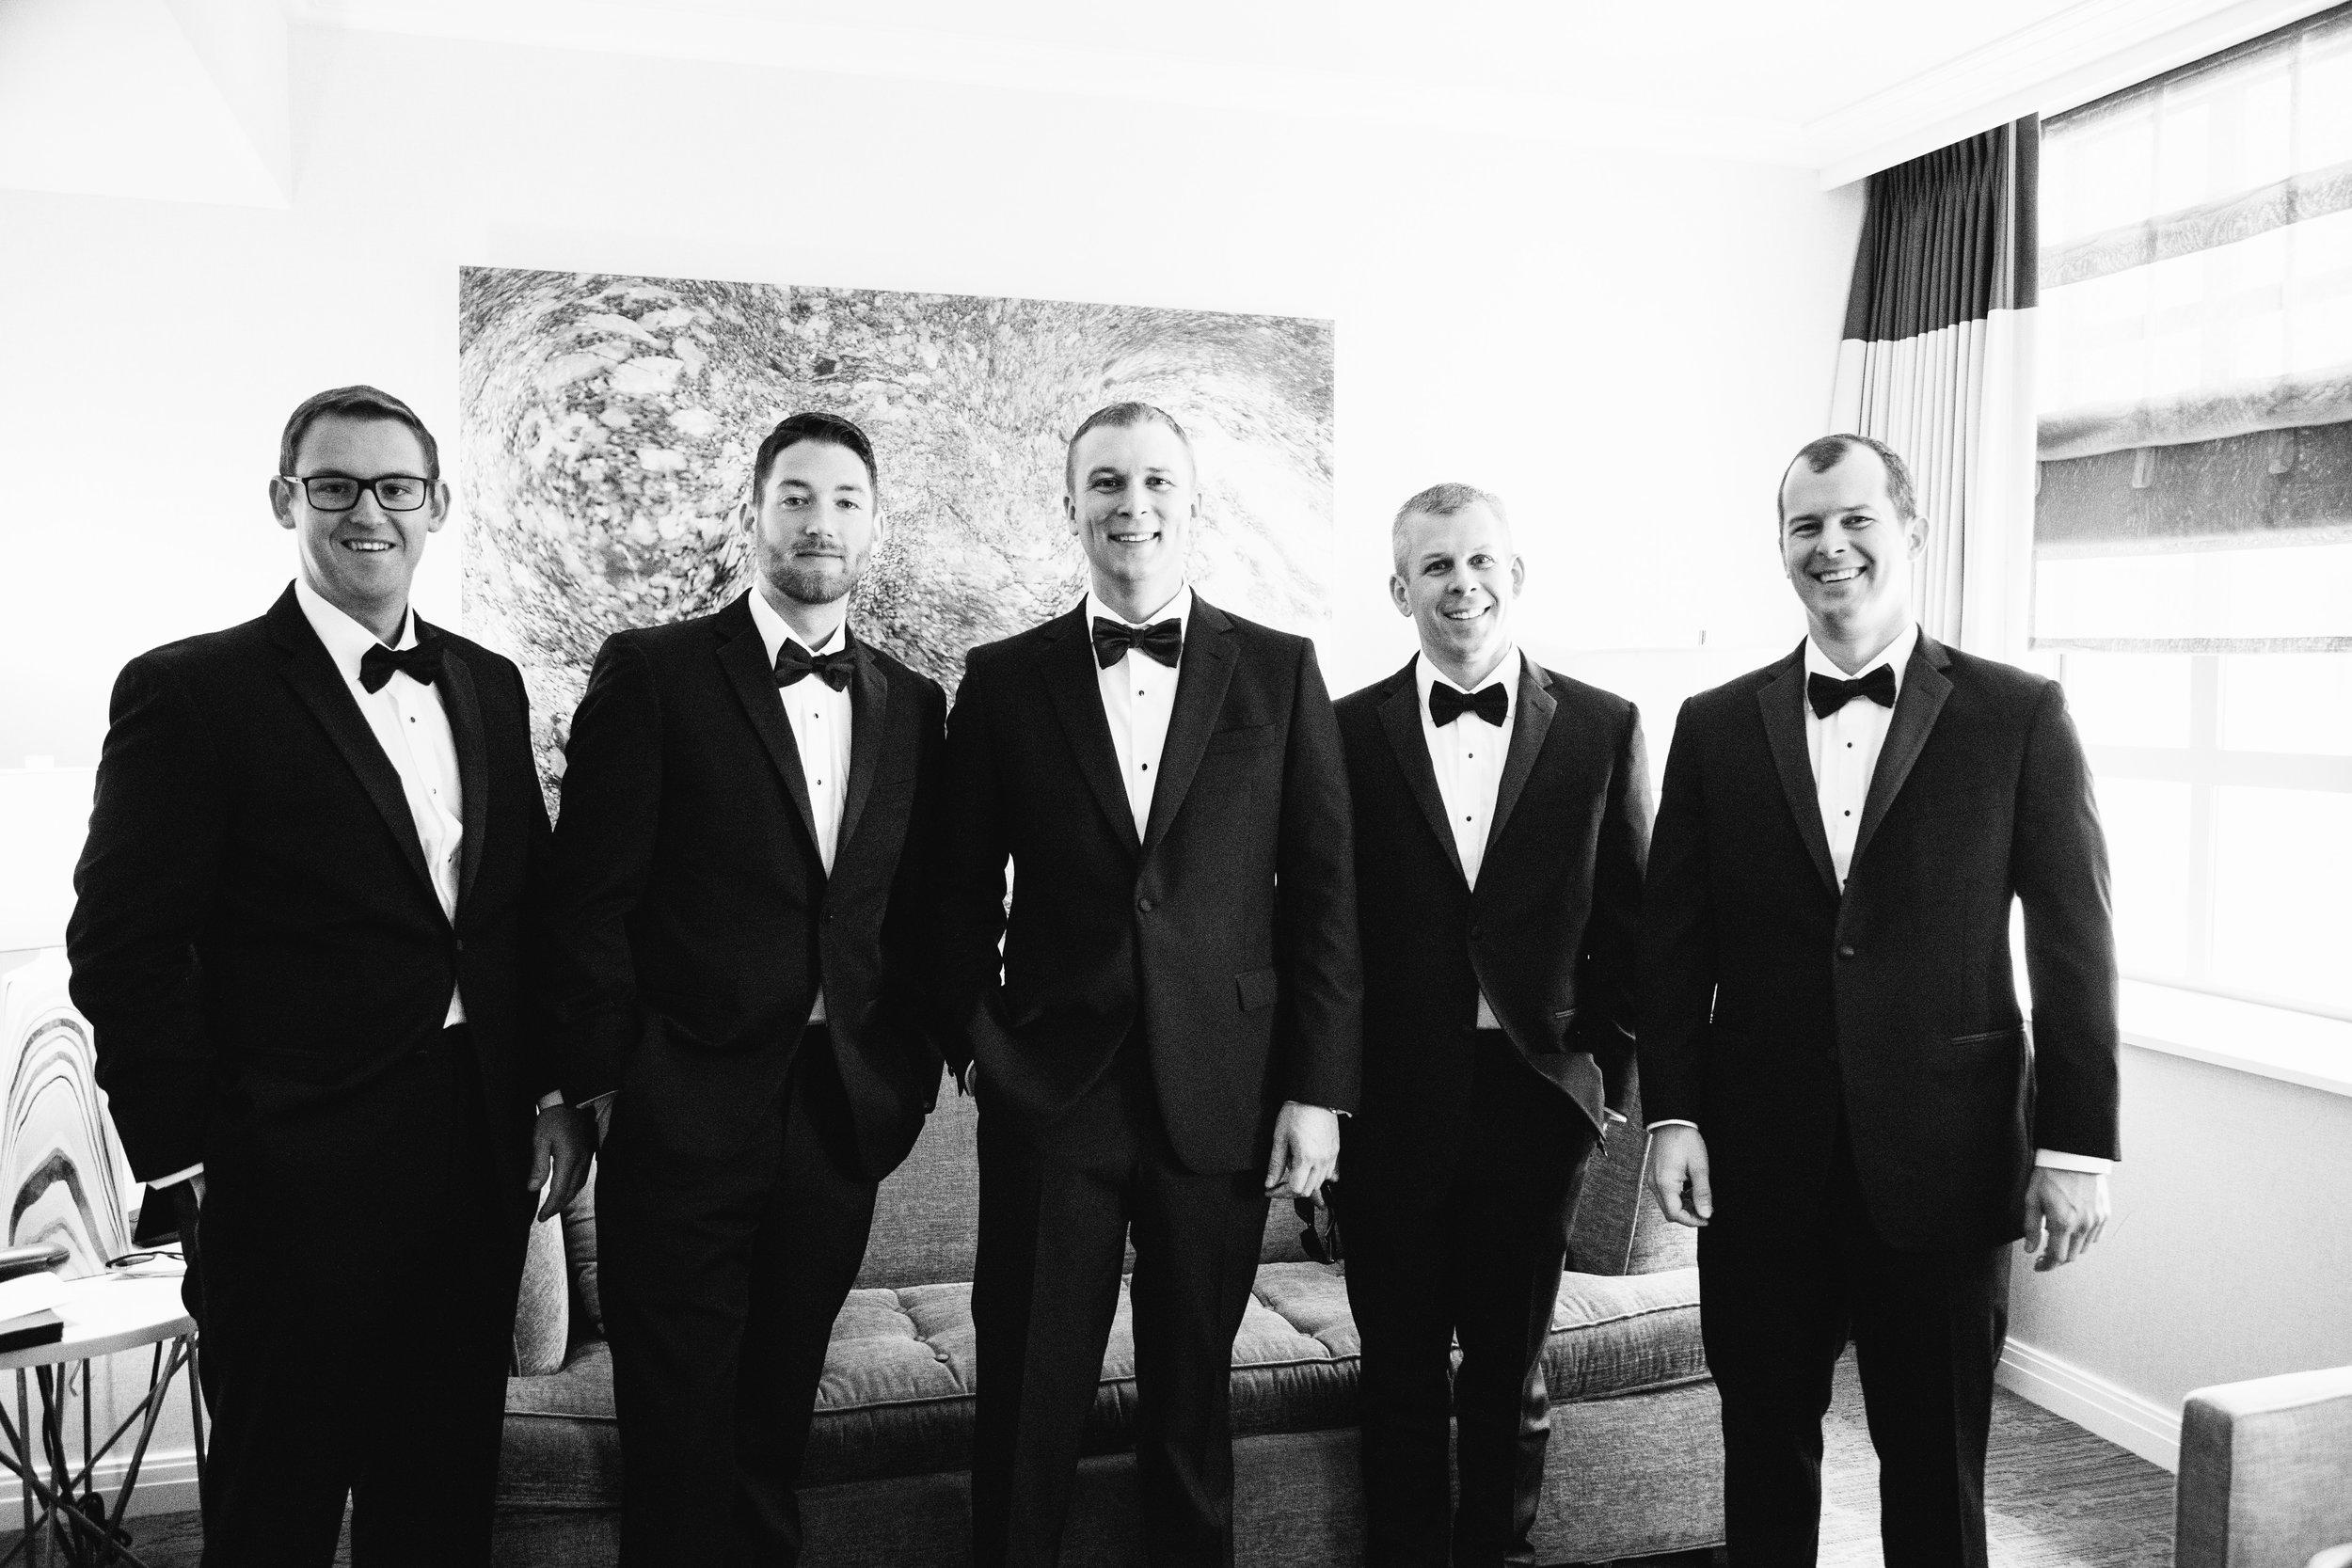 Hudson-Nichols-Black-Tie-Bride-Philadelphia-Waterworks-Wedding-Getting-Ready-Photos-29.jpg